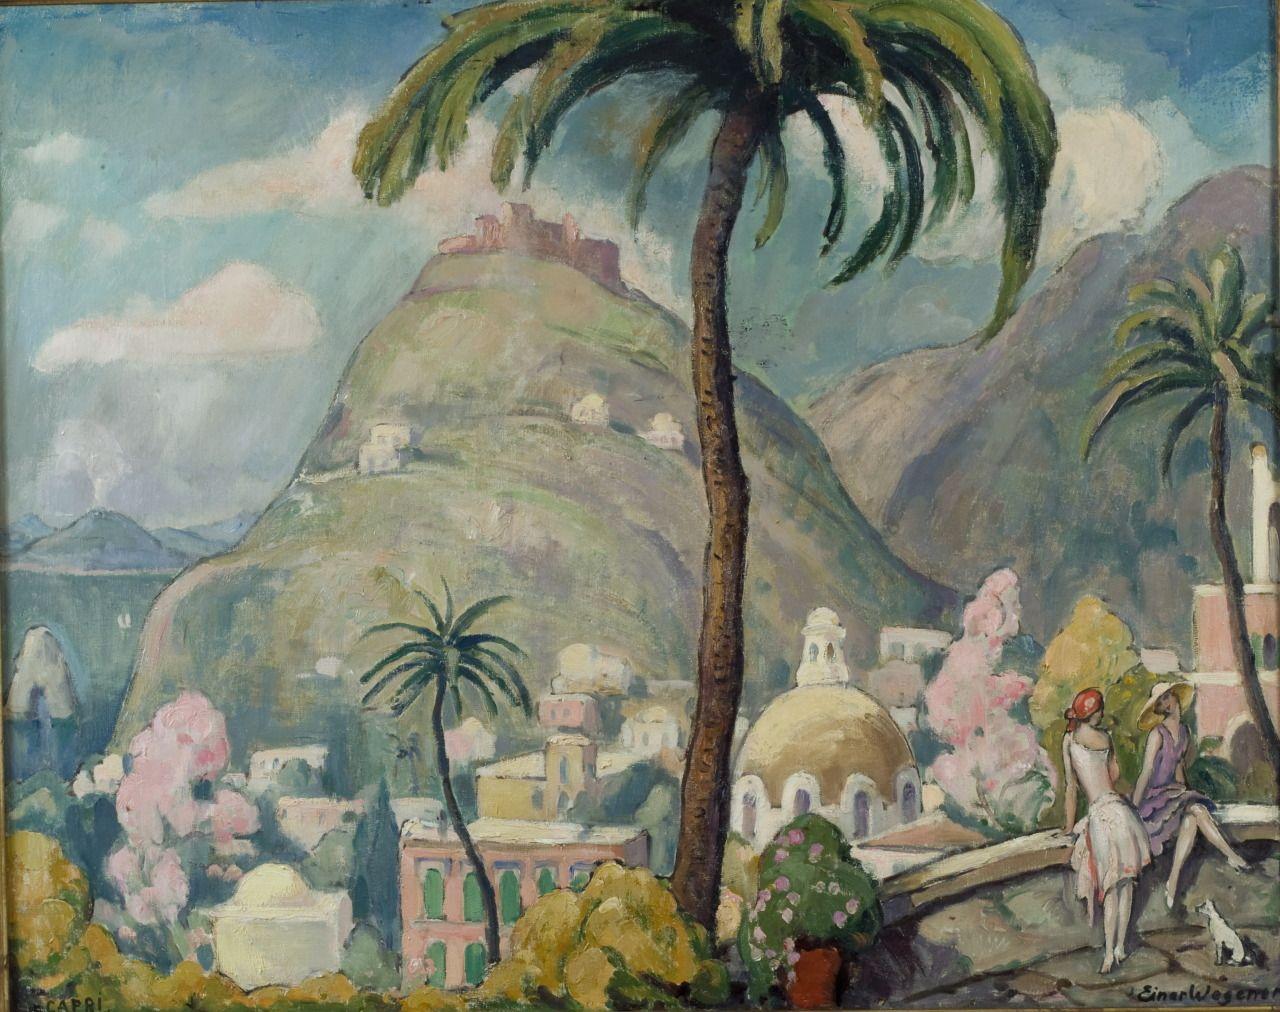 Einar Wegener Capri Italy 1stdibs Com Einar Wegener The Danish Girl Art